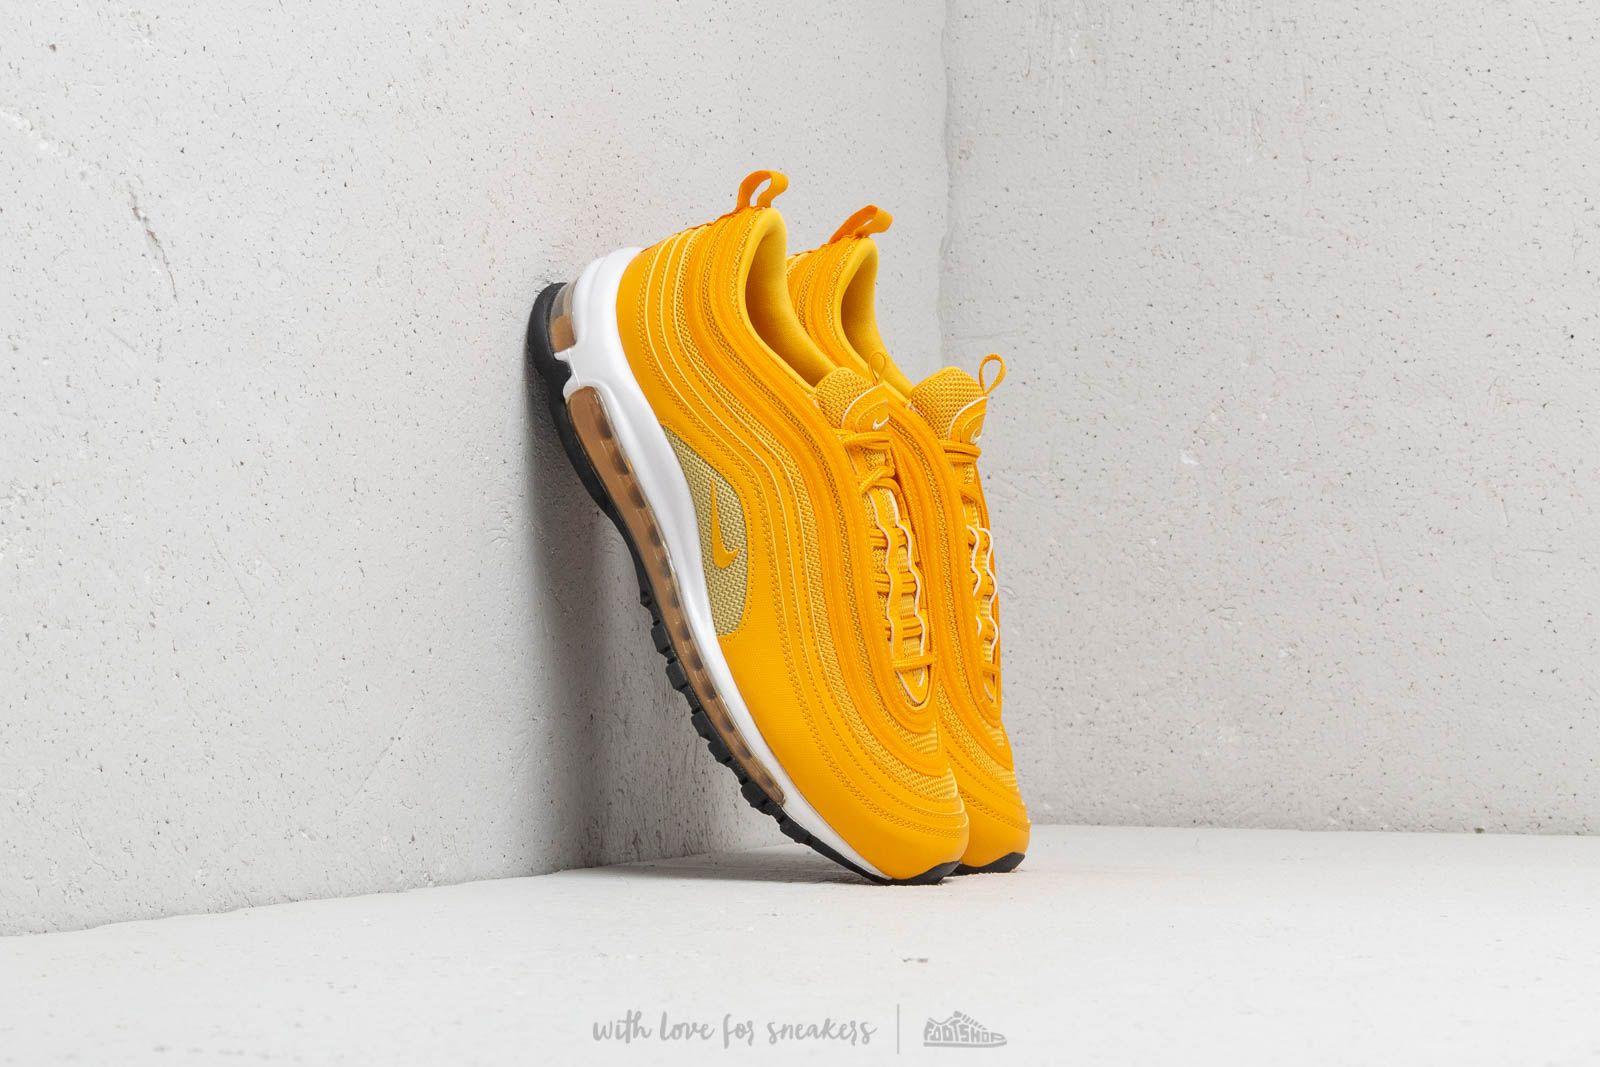 Dámské tenisky a boty Nike Air Max 97 Wm's Mustard/ Mustard-Buff Gold